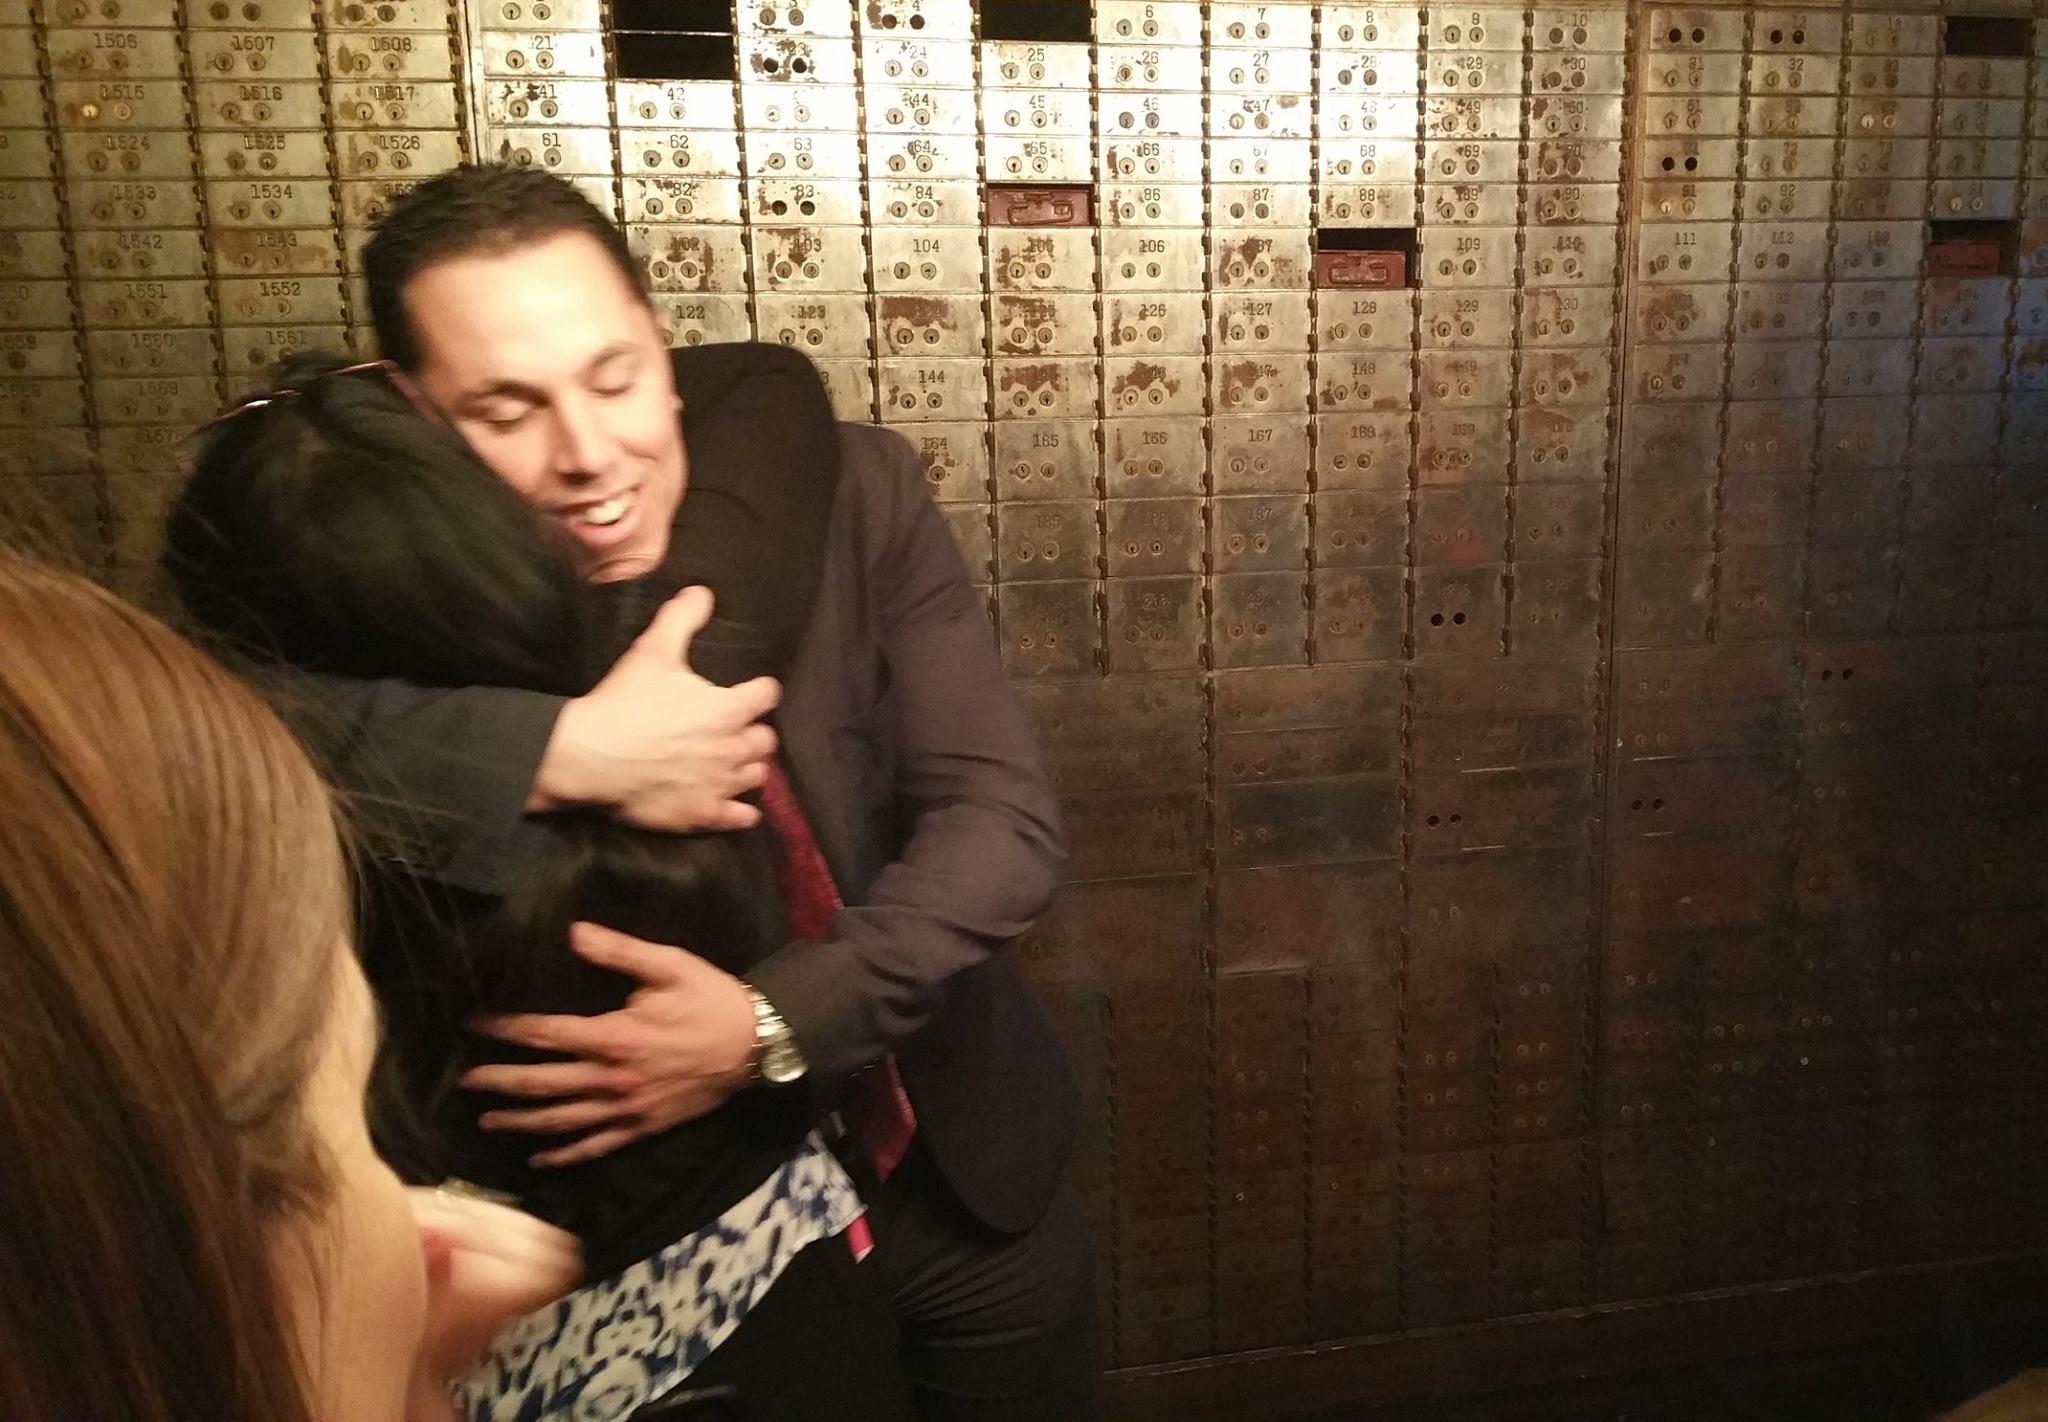 Good time with family - hugs.jpg